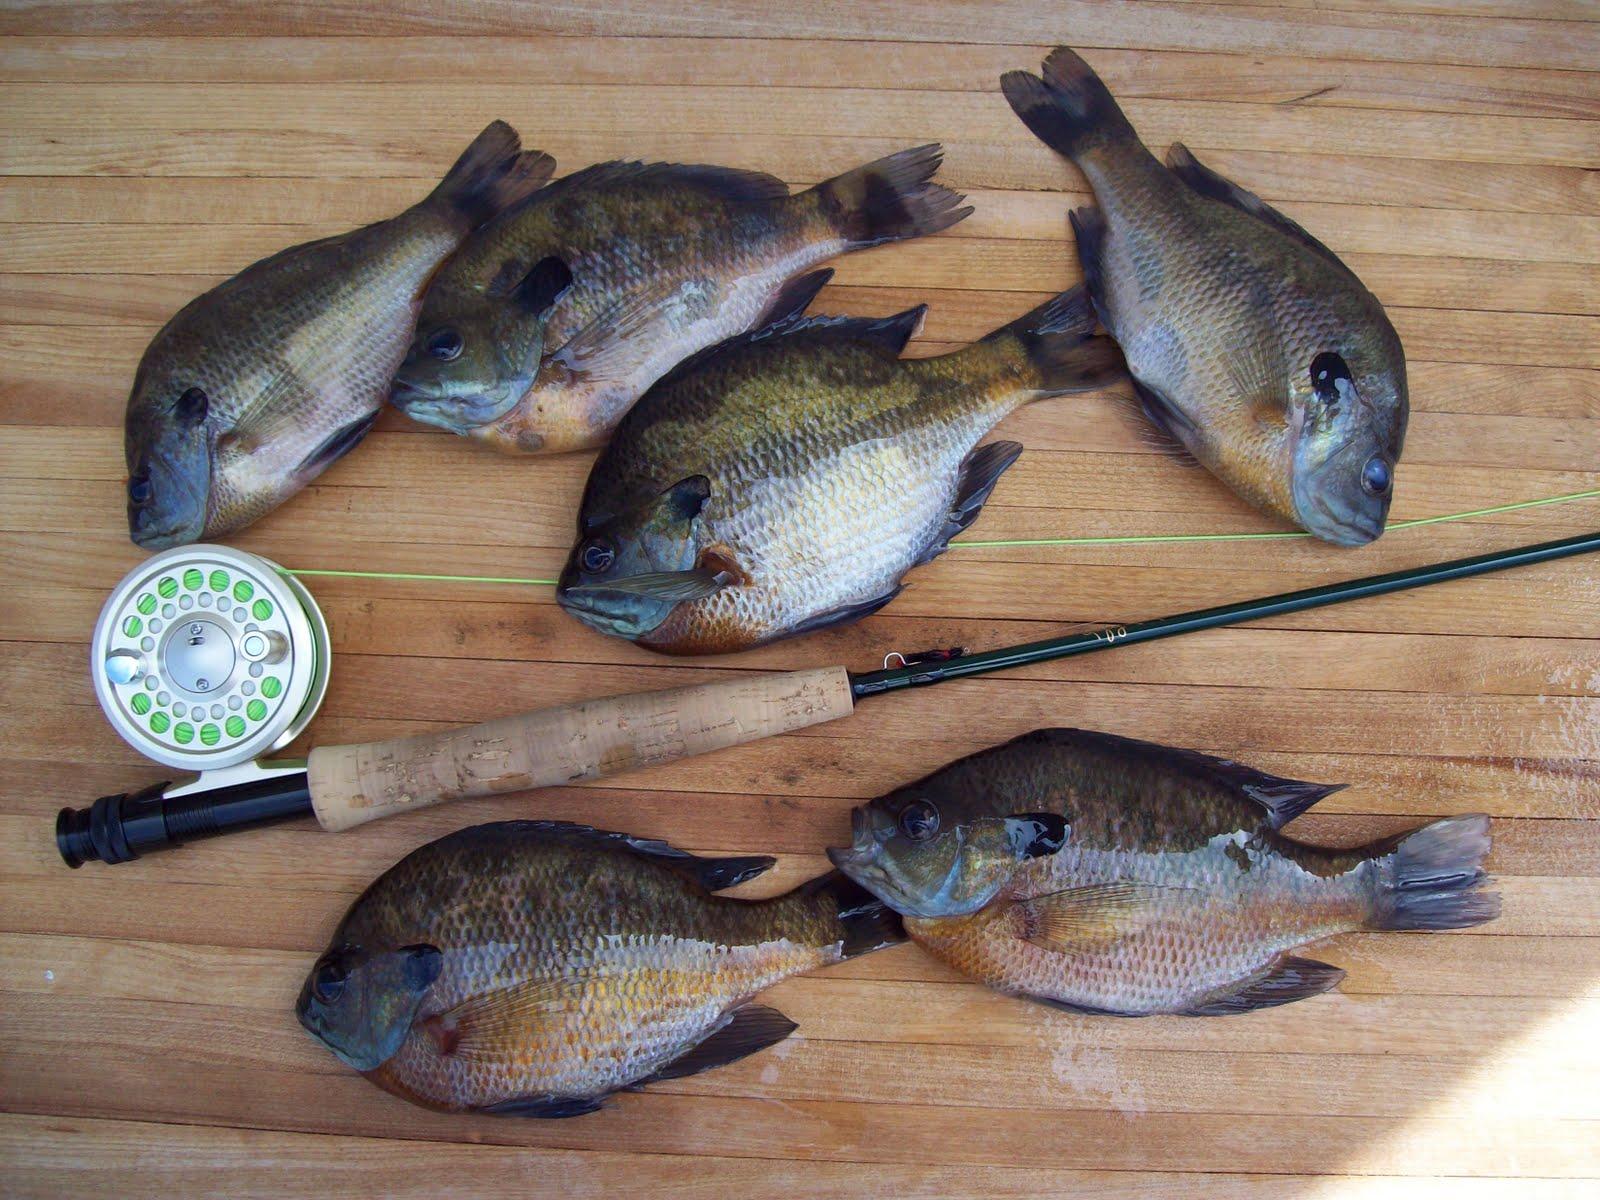 Fishing through life bluegill on my local lake for G loomis fish